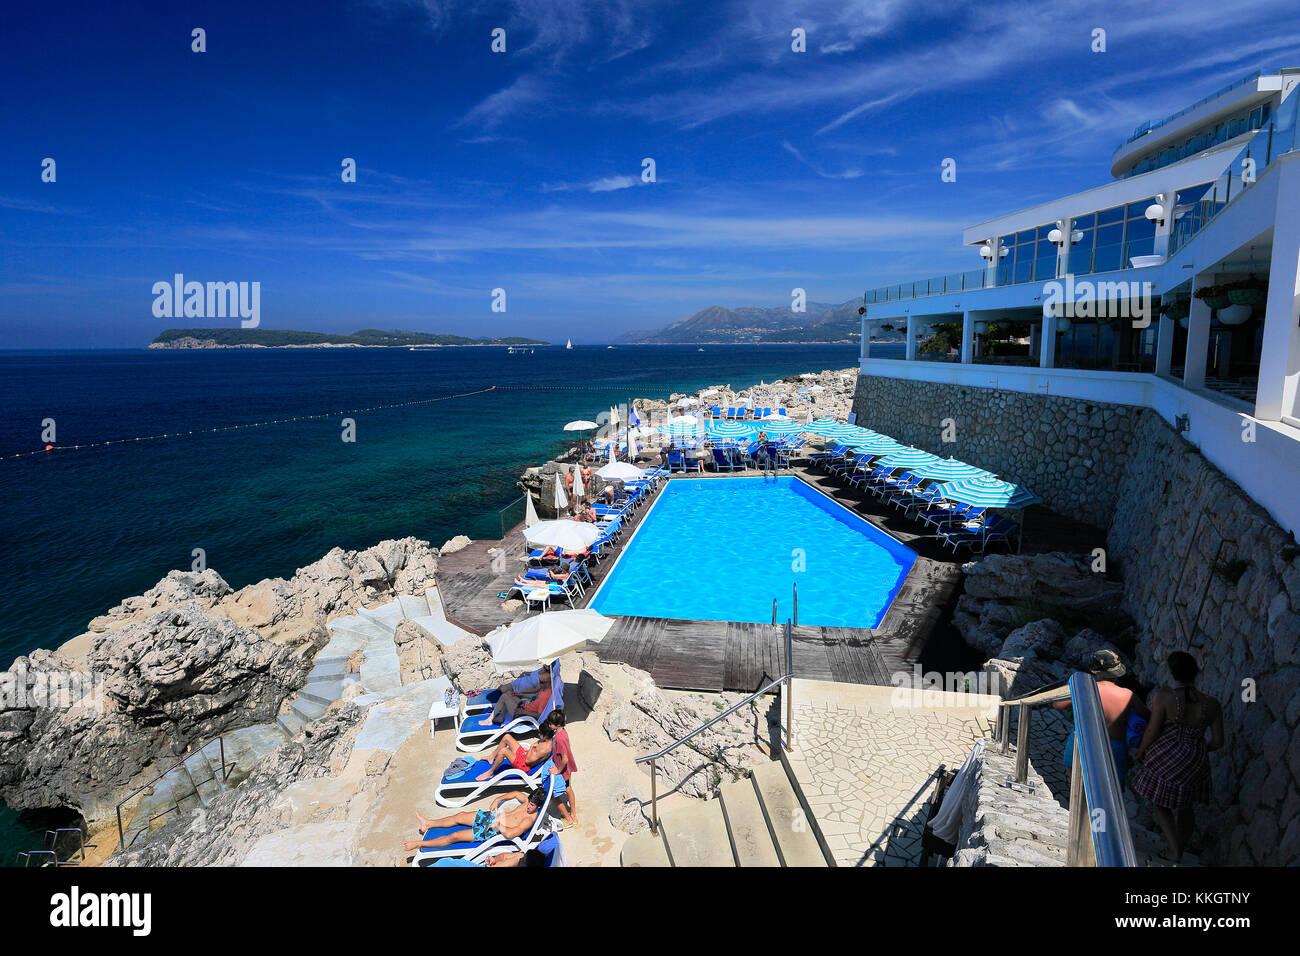 The Ariston Hotel, Lapad town, Dubrovnik, Dalmatian coast, Adriatic Sea, Croatia, Europe. Stock Photo